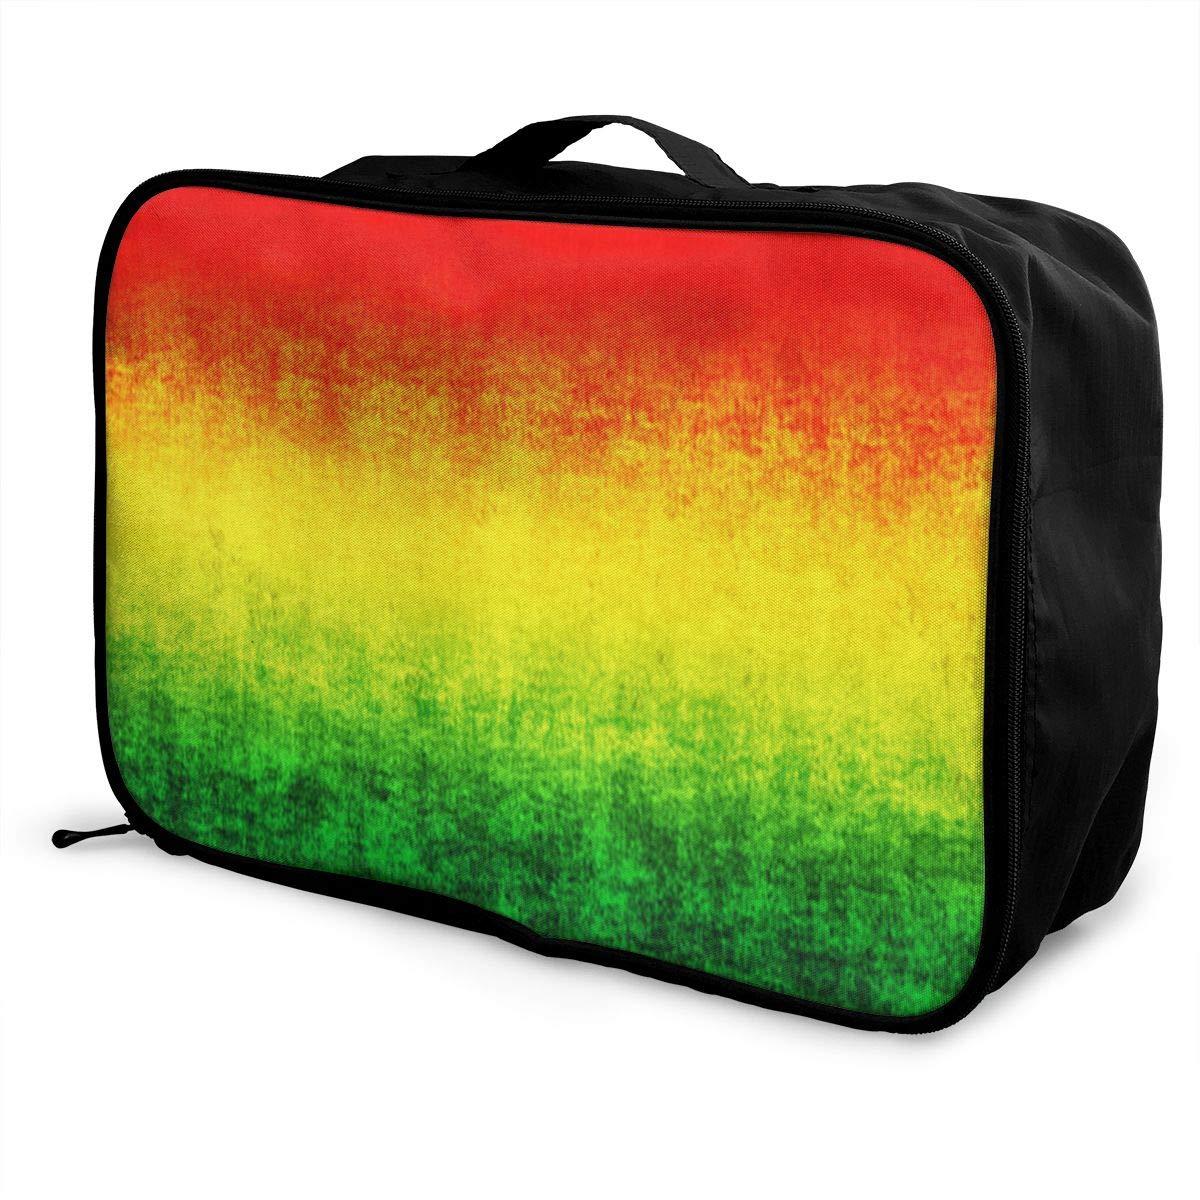 Large Feature Rasta Grunge Travel Duffel Bag Casual Large Capacity Portable Luggage Bag Suitcase Storage Bag Luggage Packing Tote Bag Weekend Trip